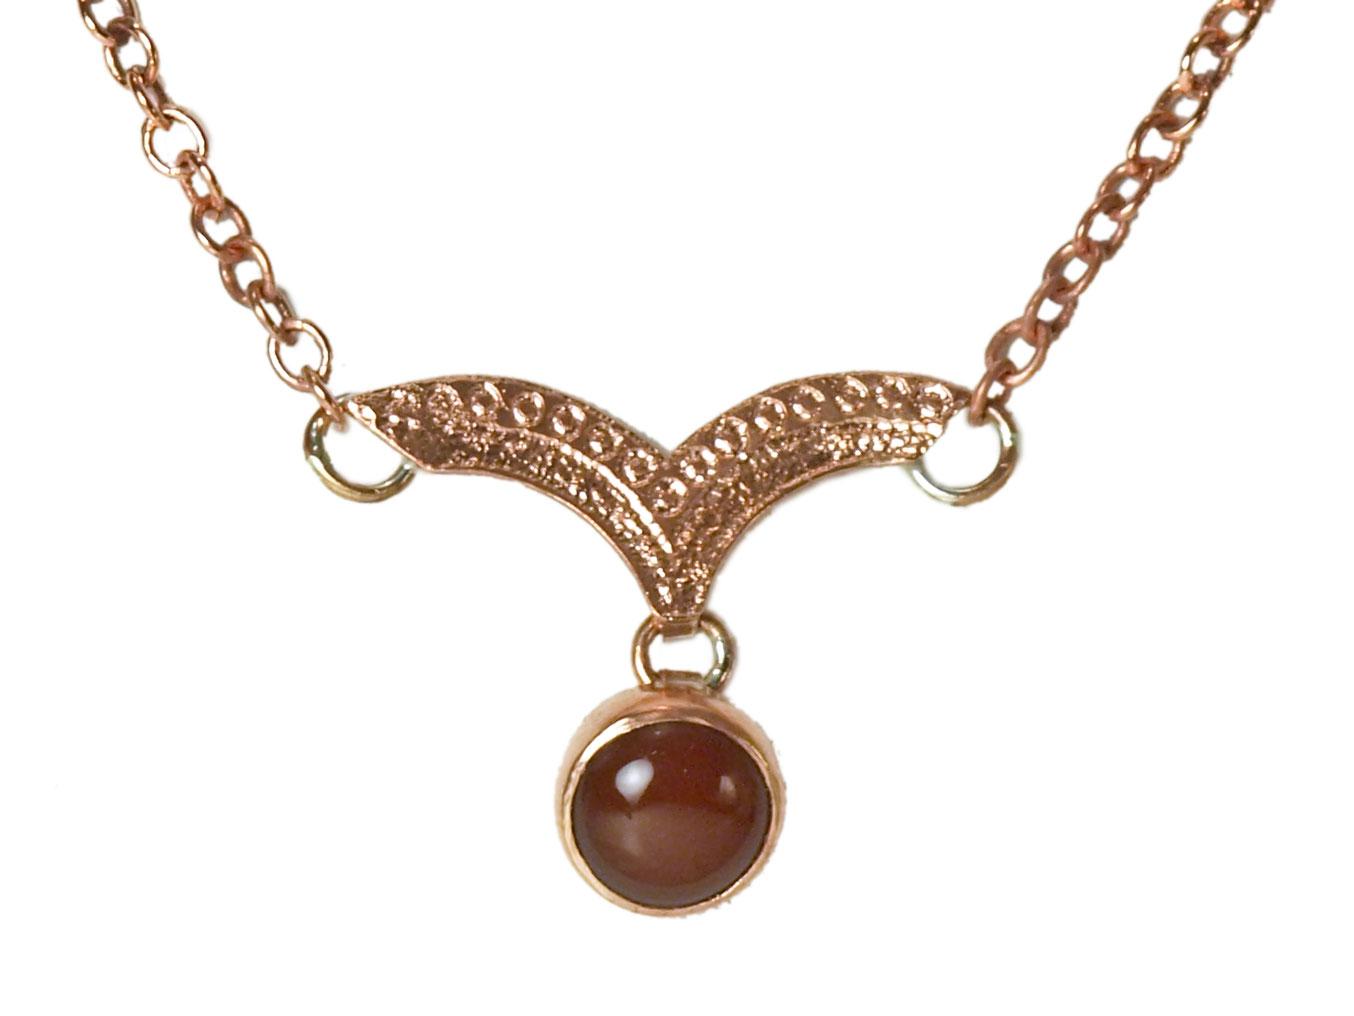 Dew Drop Necklace with Carnelian